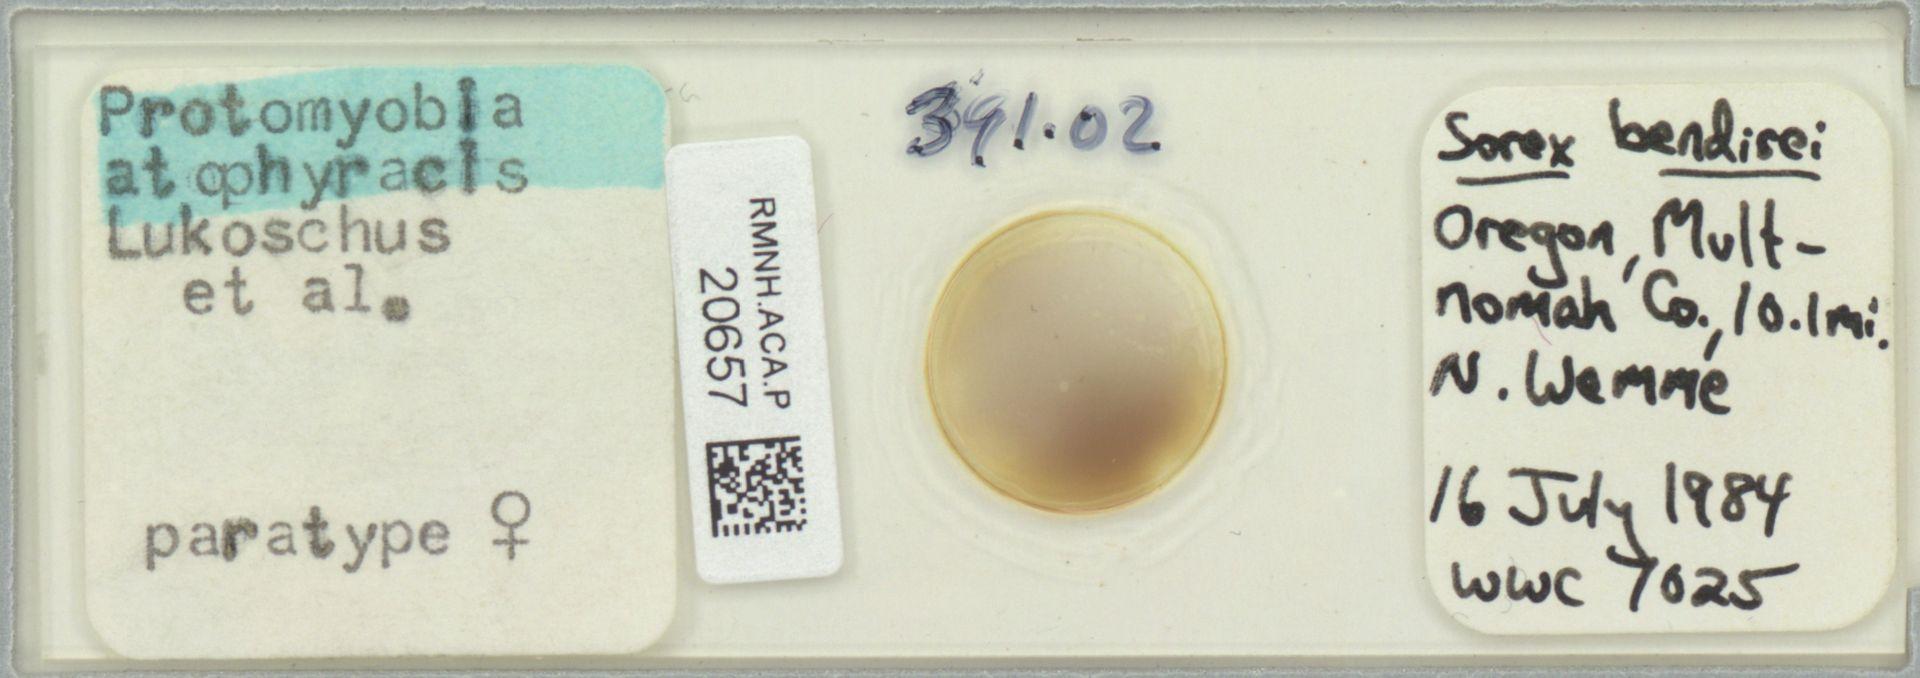 RMNH.ACA.P.20657 | Protomyoba atophyracis